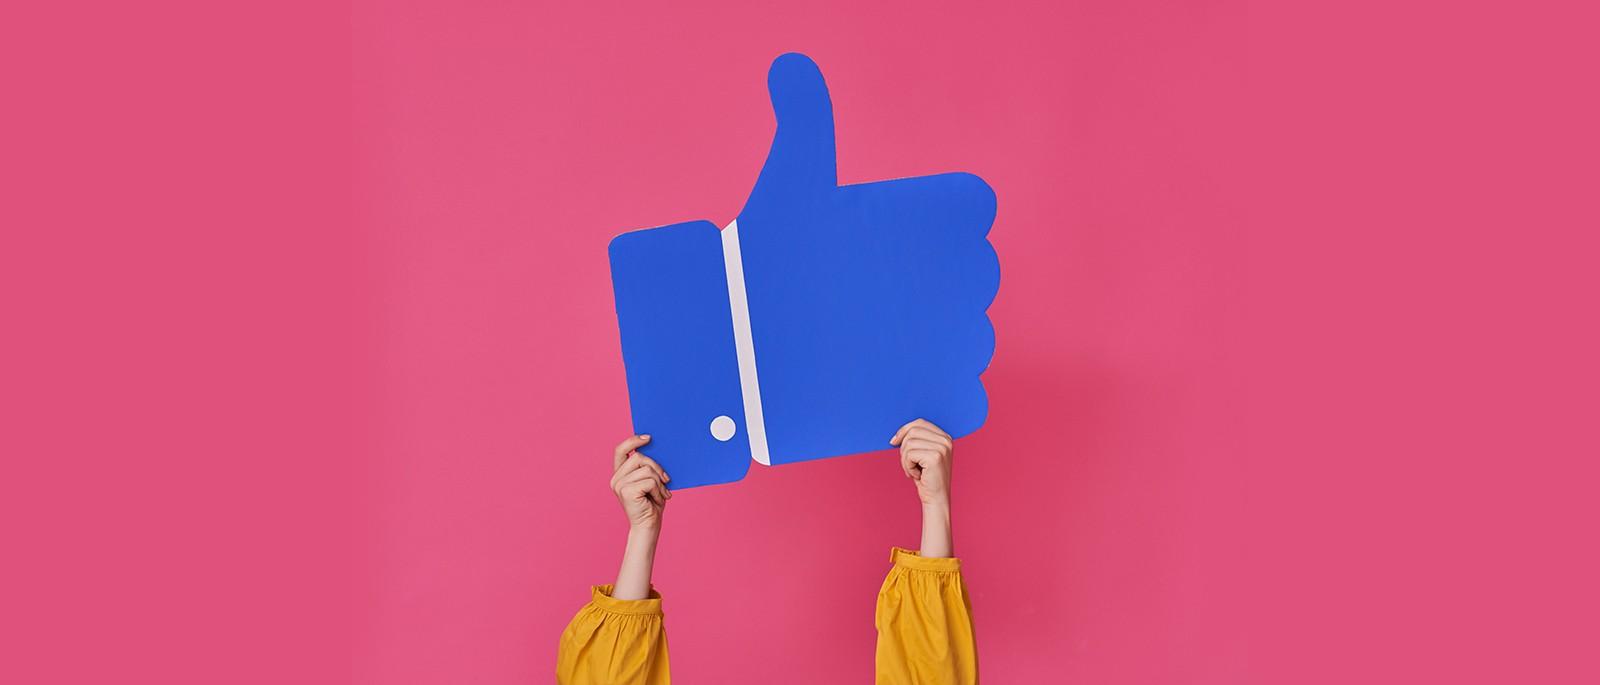 Social media - friend or foe?